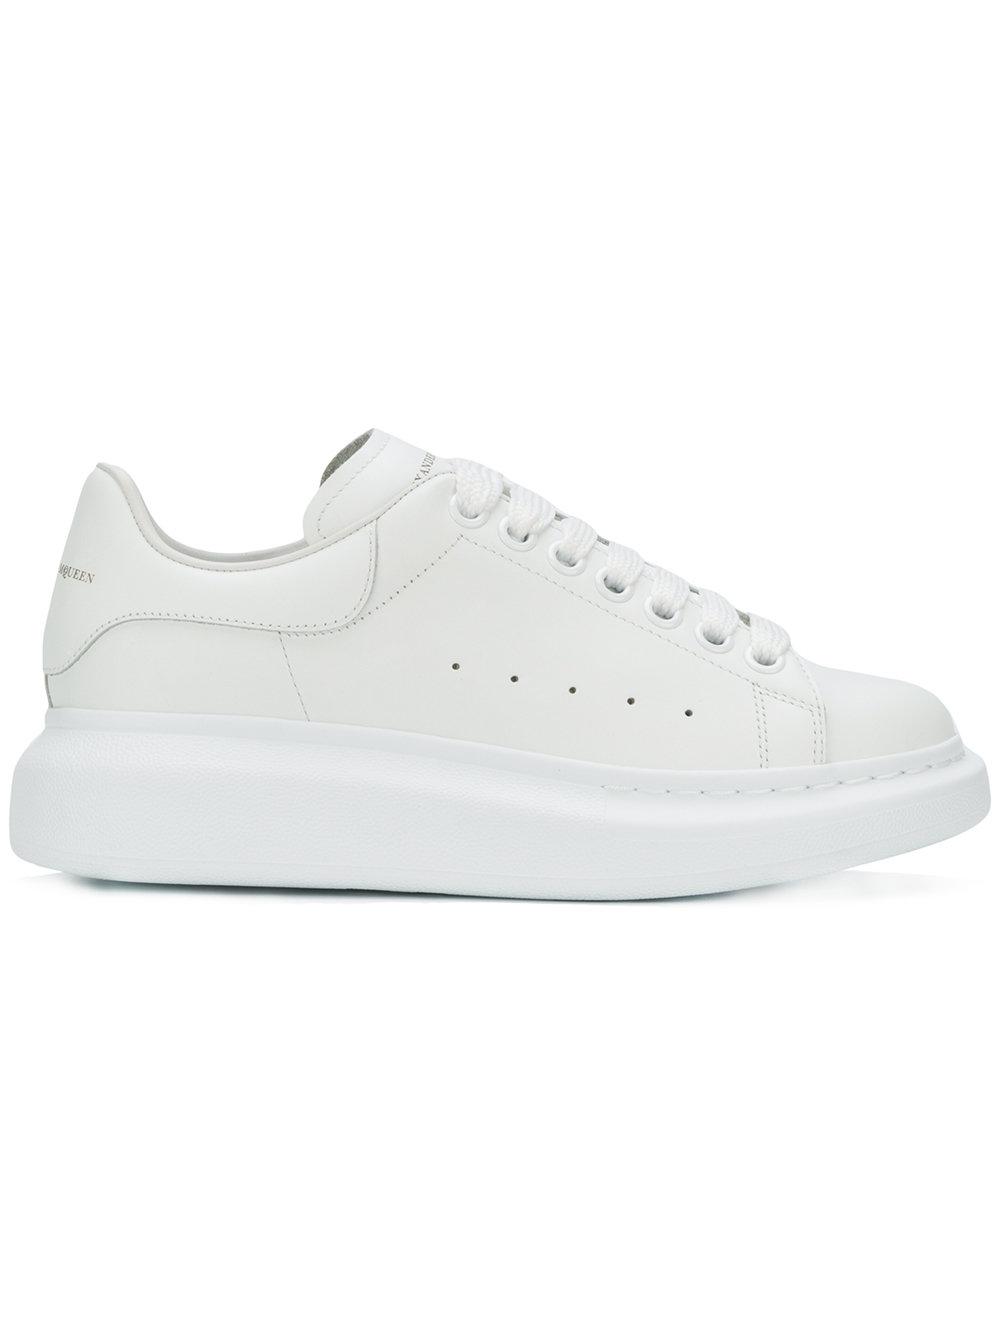 fb2953d81 Alexander McQueen кроссовки на увеличенной подошве - Glami.ru